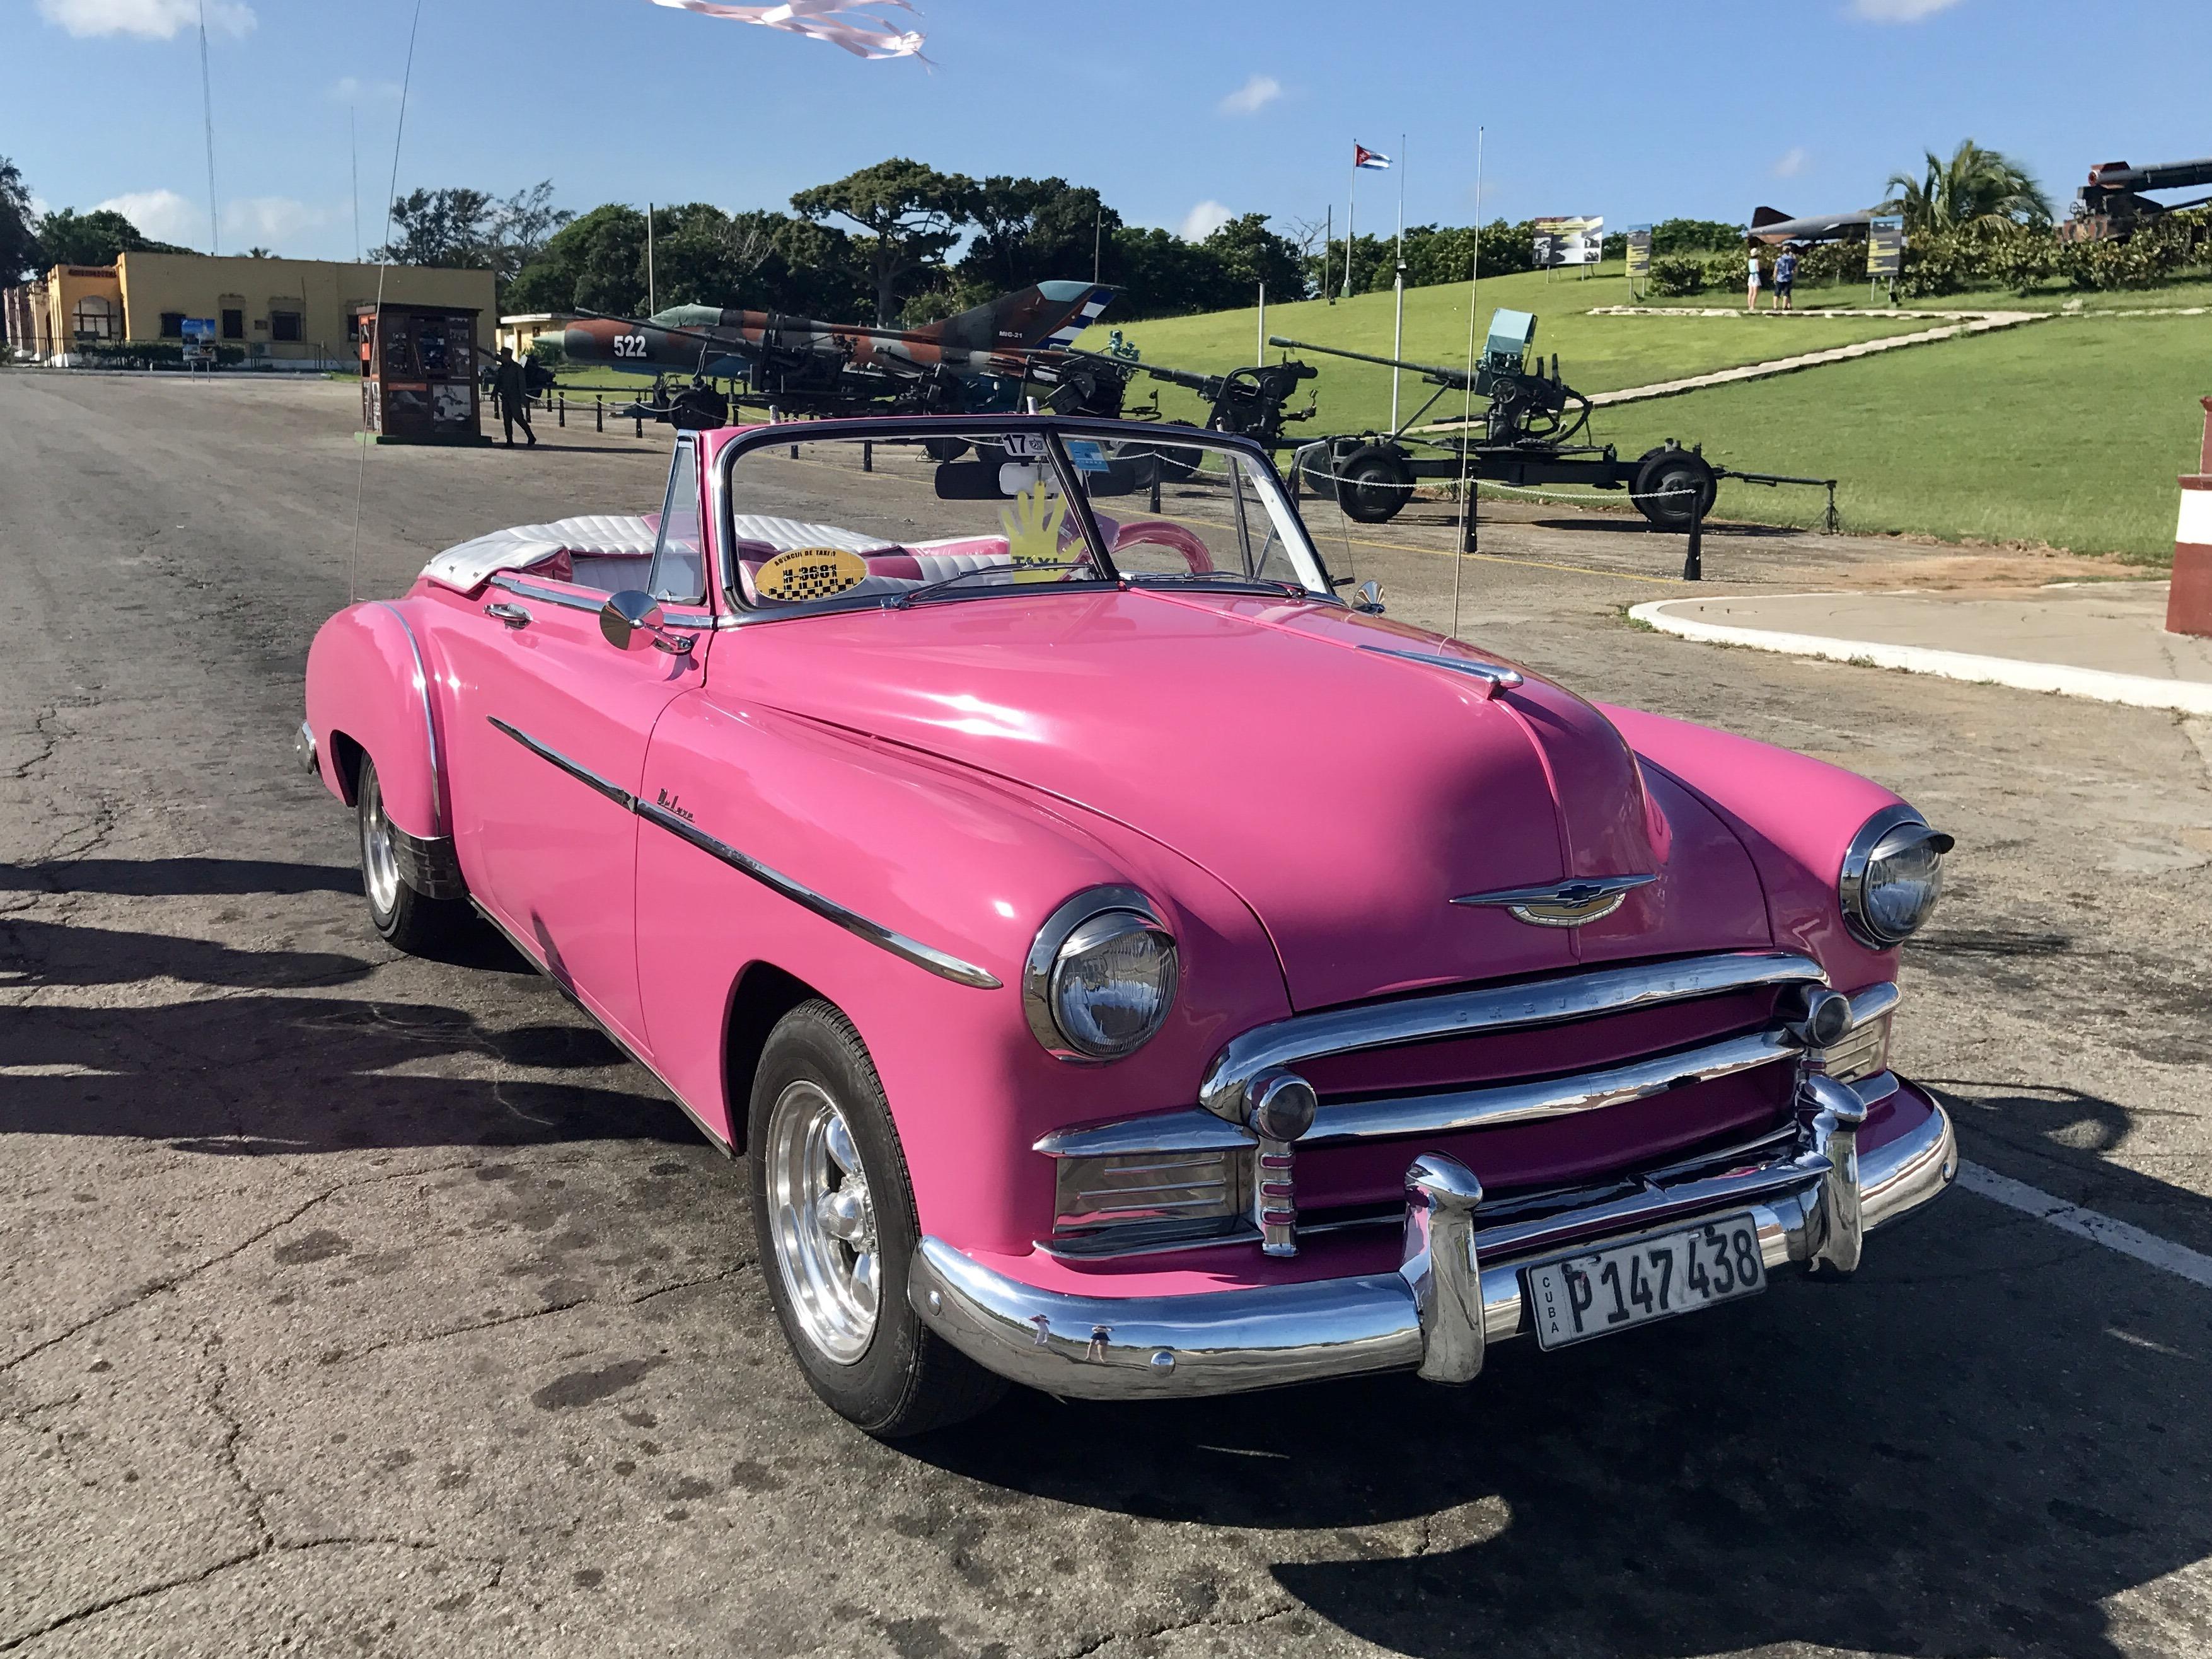 car tour, Havana